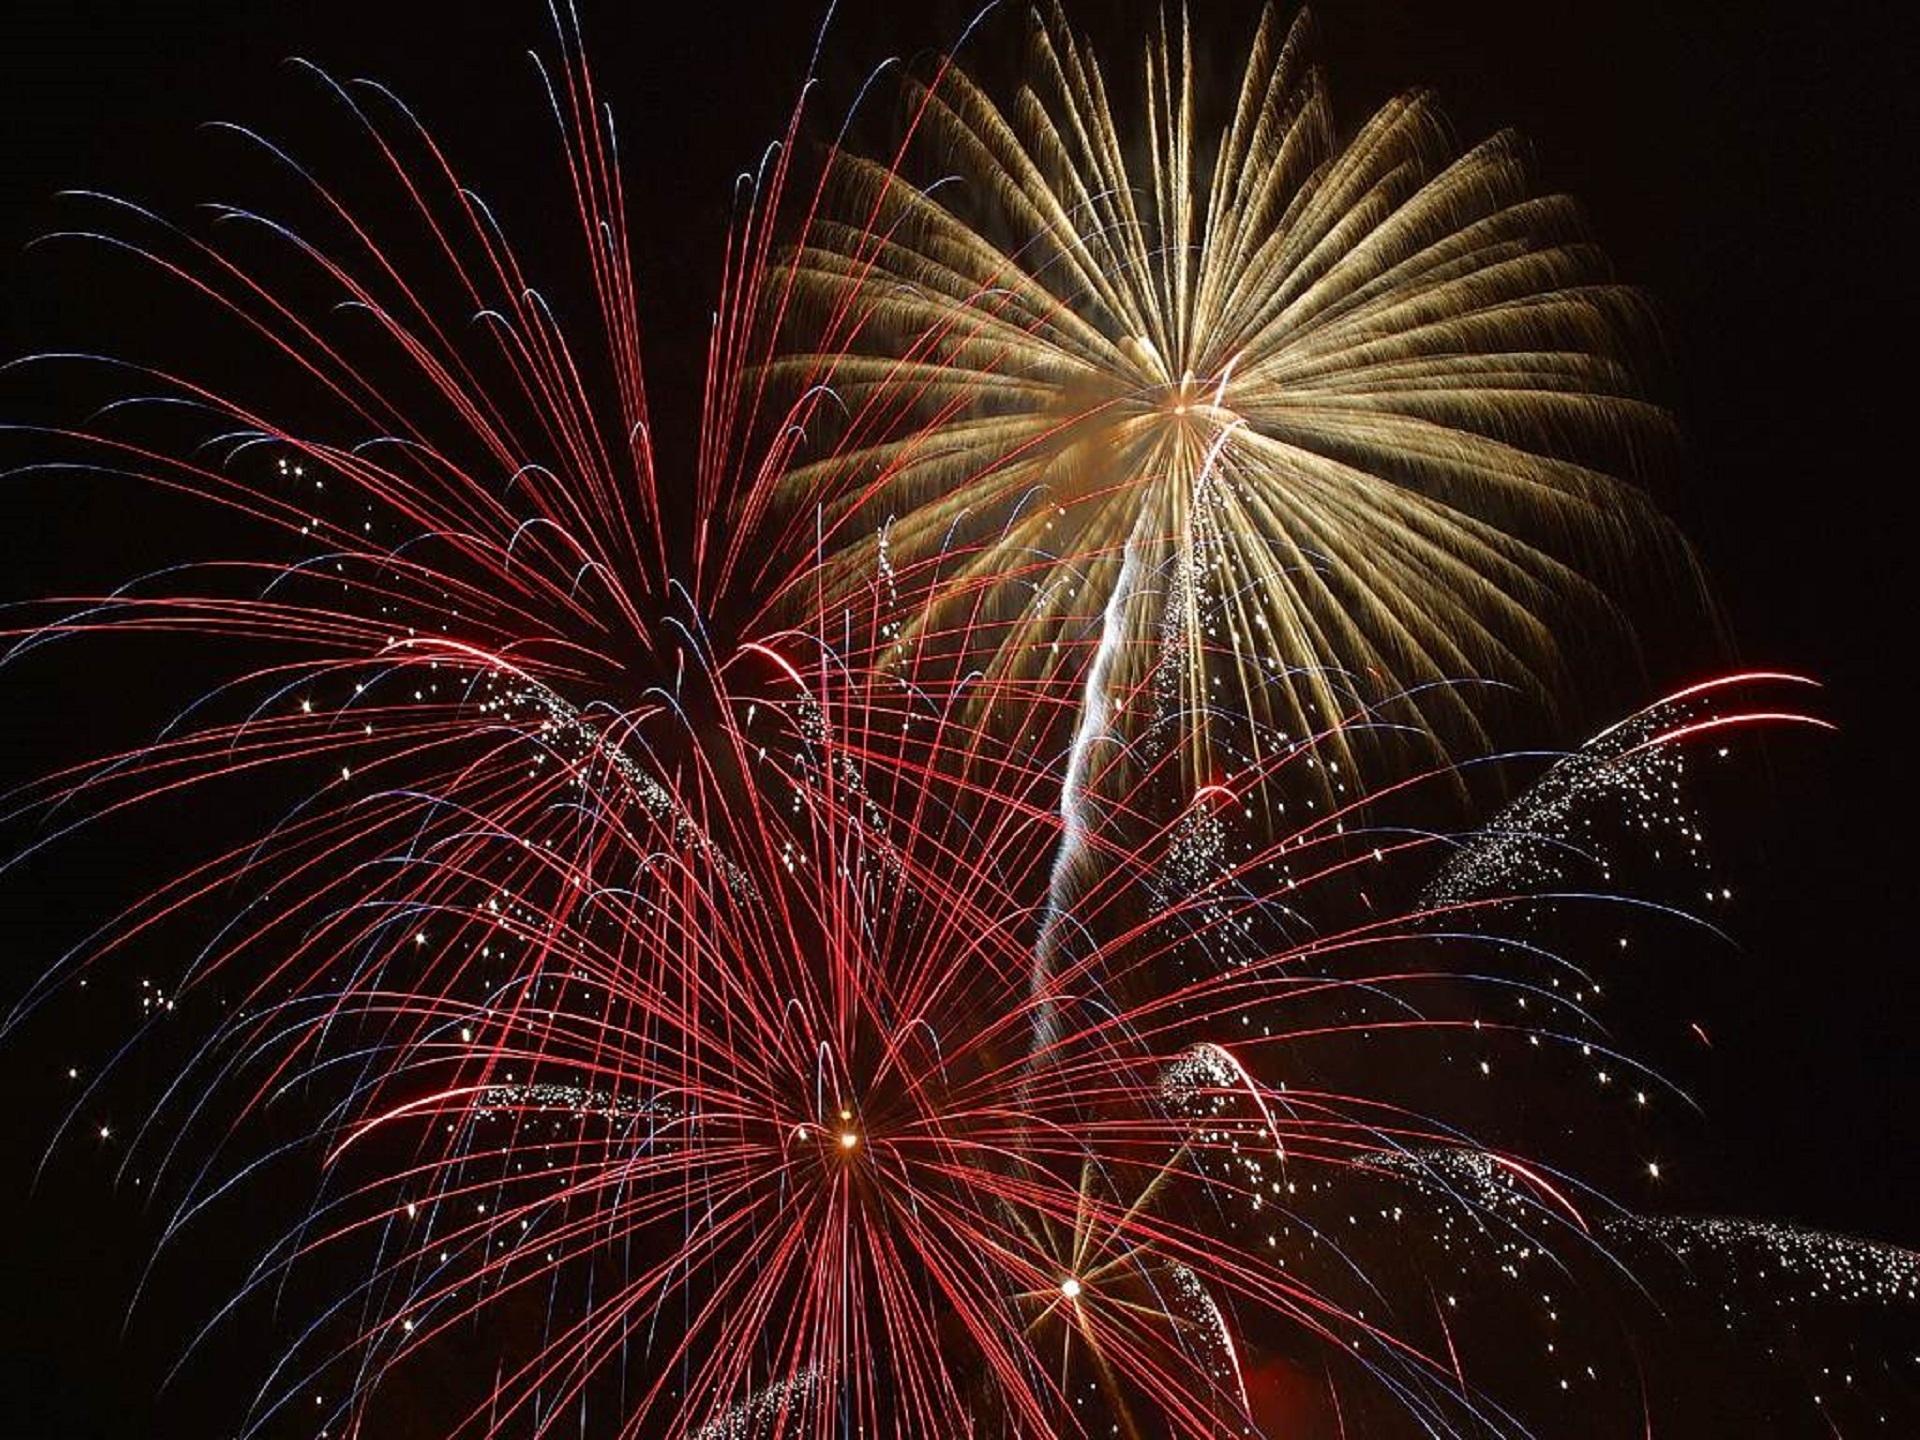 Bonfire Fireworks Events Yorkshire Wonders (2)